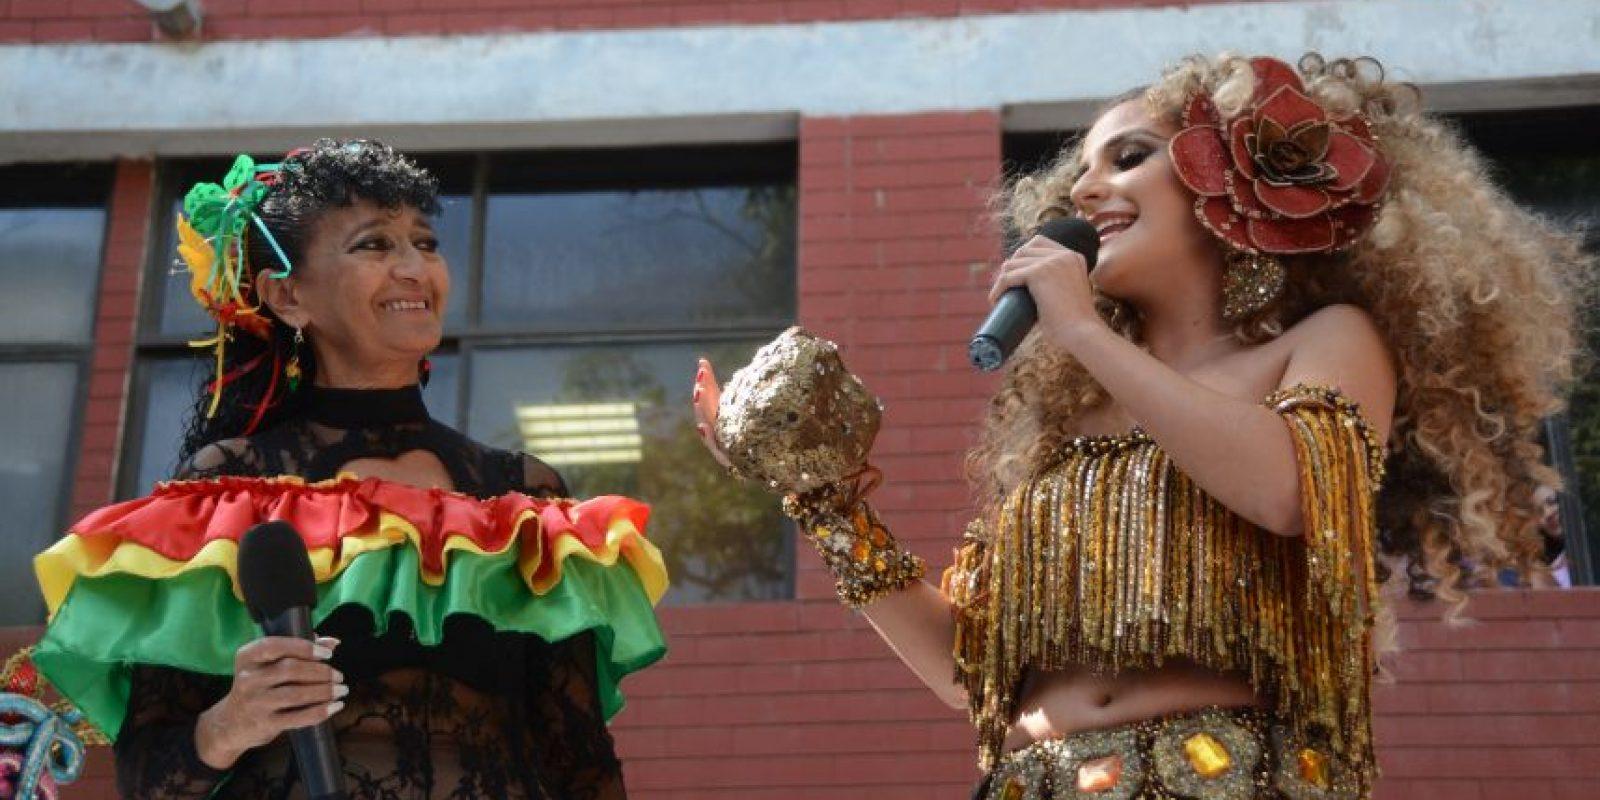 La Reina del Carnaval de Barranquilla junto a Ninfa Barrios quien personifica a La Loca en el Carnaval. Foto:Carnaval S.A.